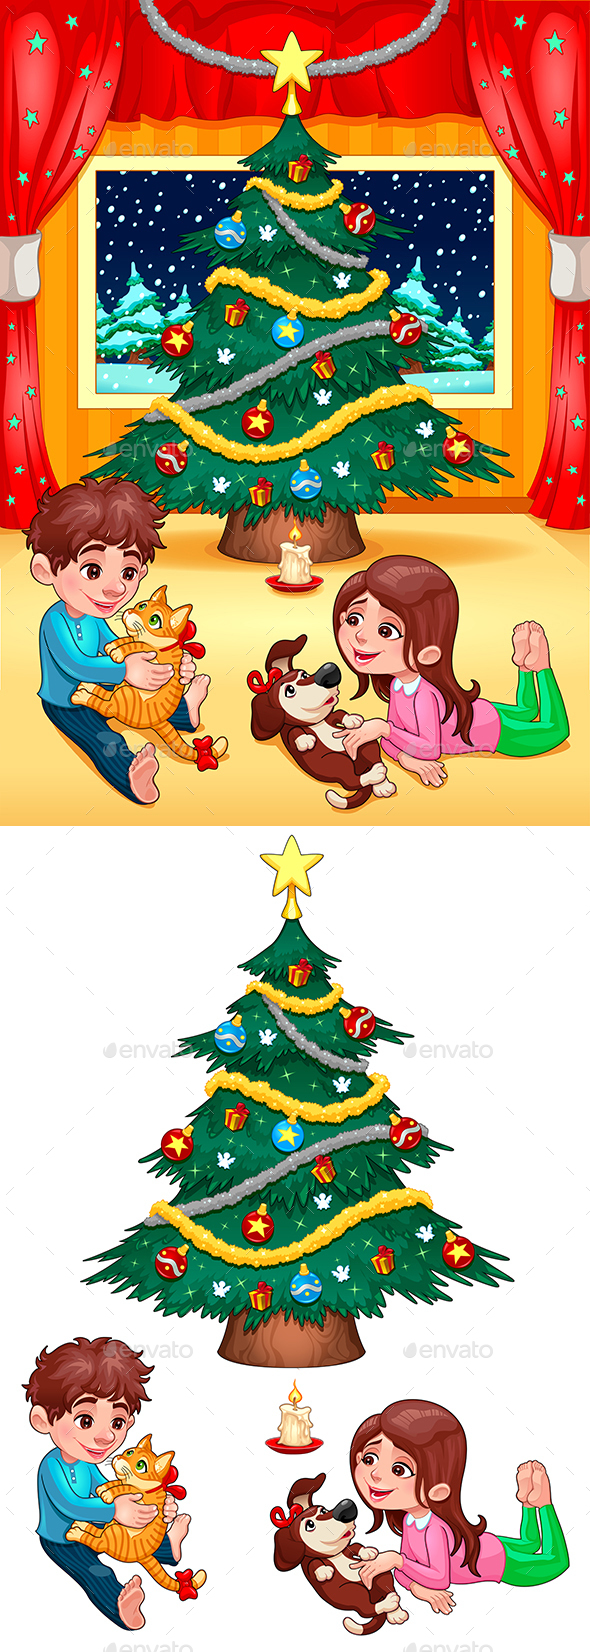 Christmas Scene with Children and Pets - Christmas Seasons/Holidays